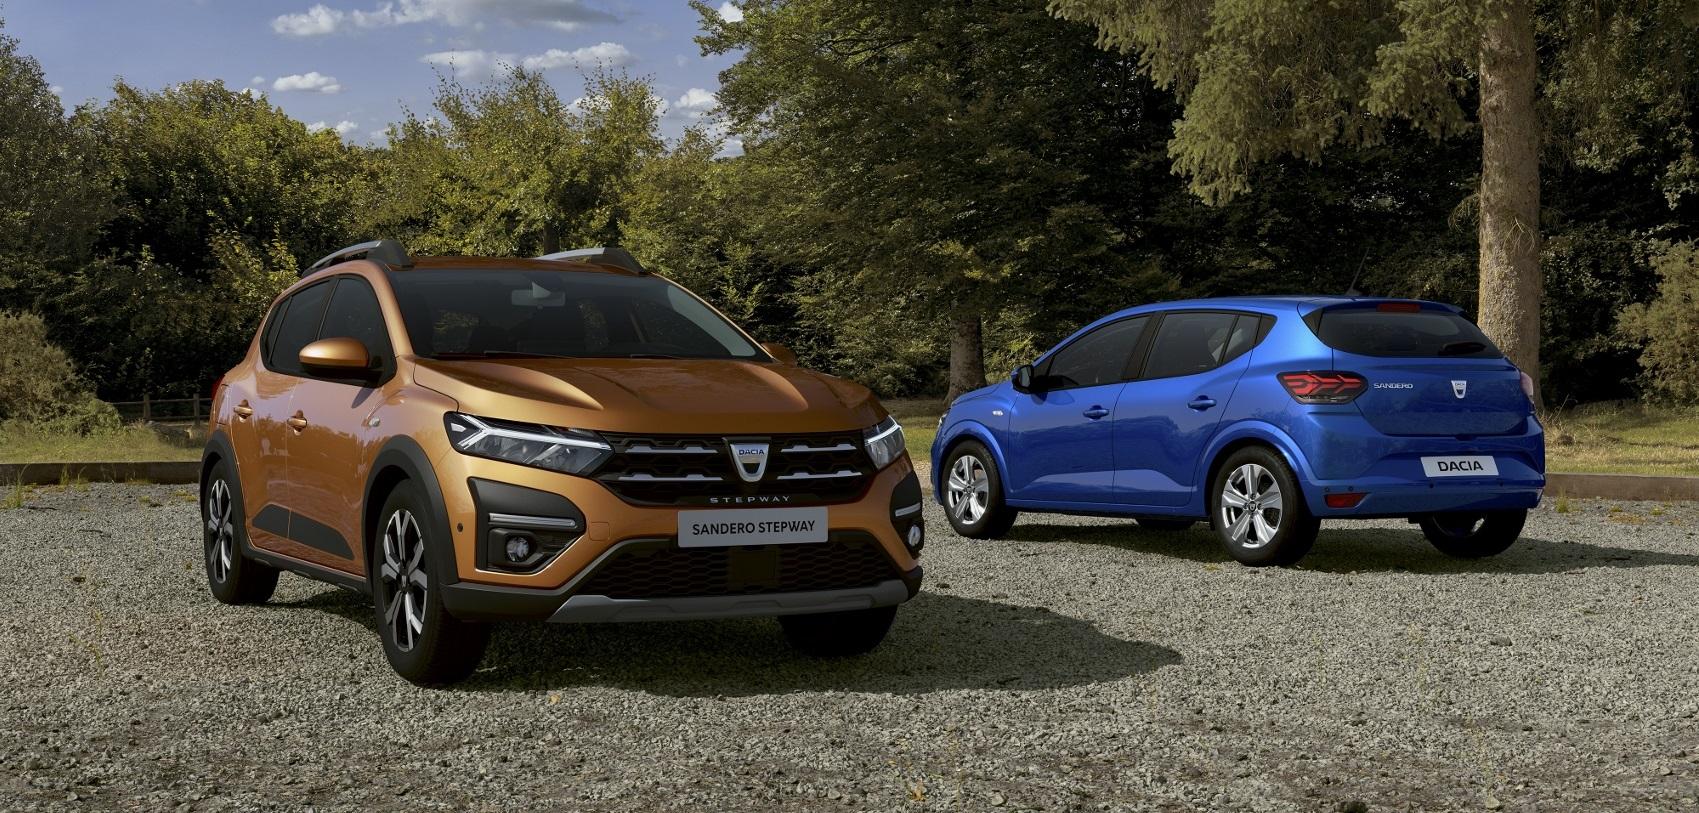 2020 - New Dacia SANDERO and SANDERO STEPWAY (1700x1275)